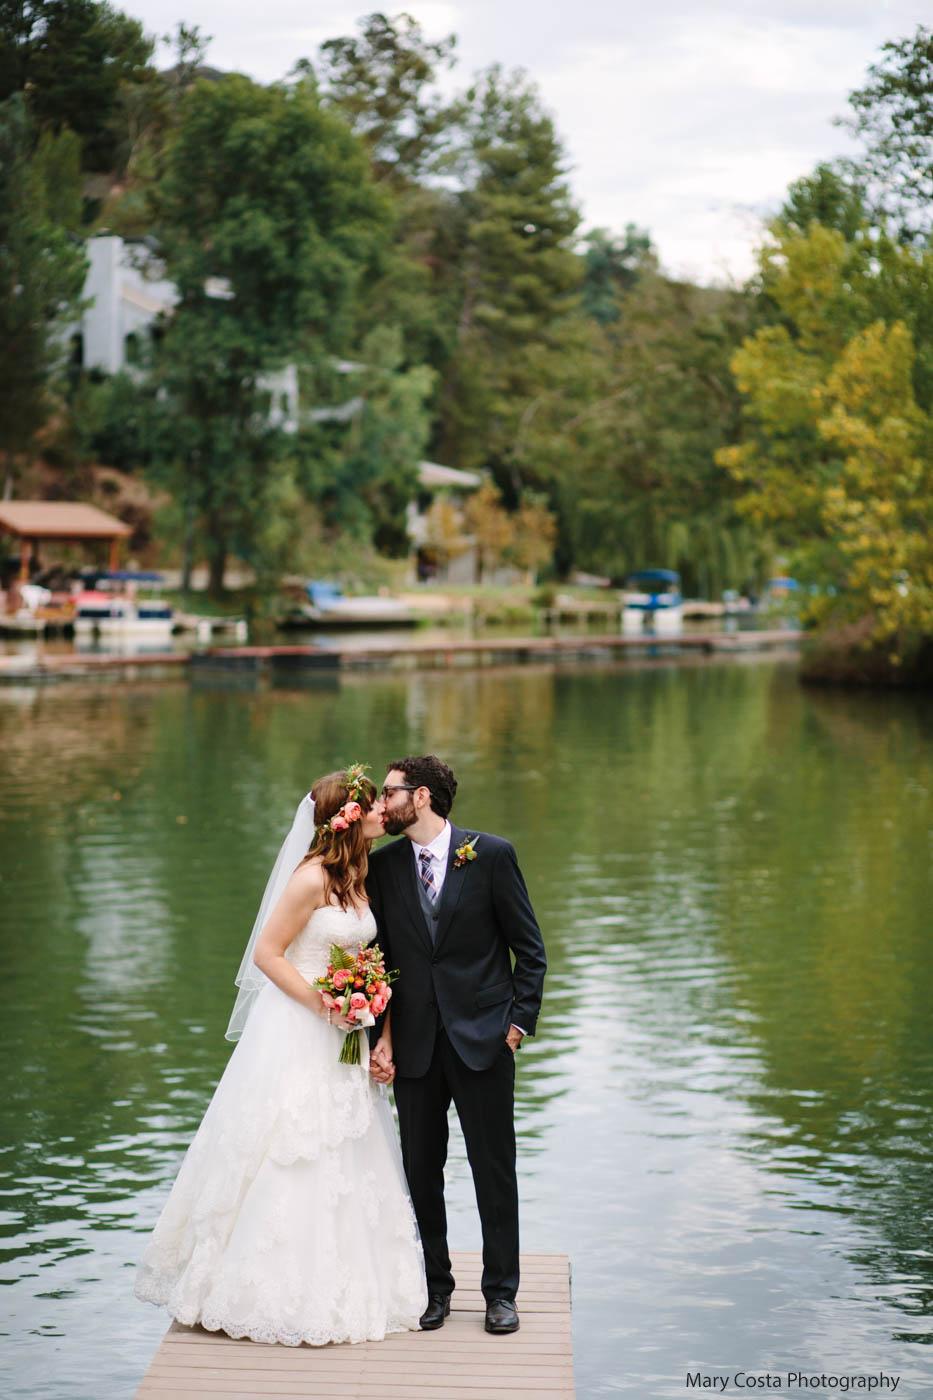 lakeside-kiss-malibou-lake-lodge-wedding-mary-costa-photography.jpg